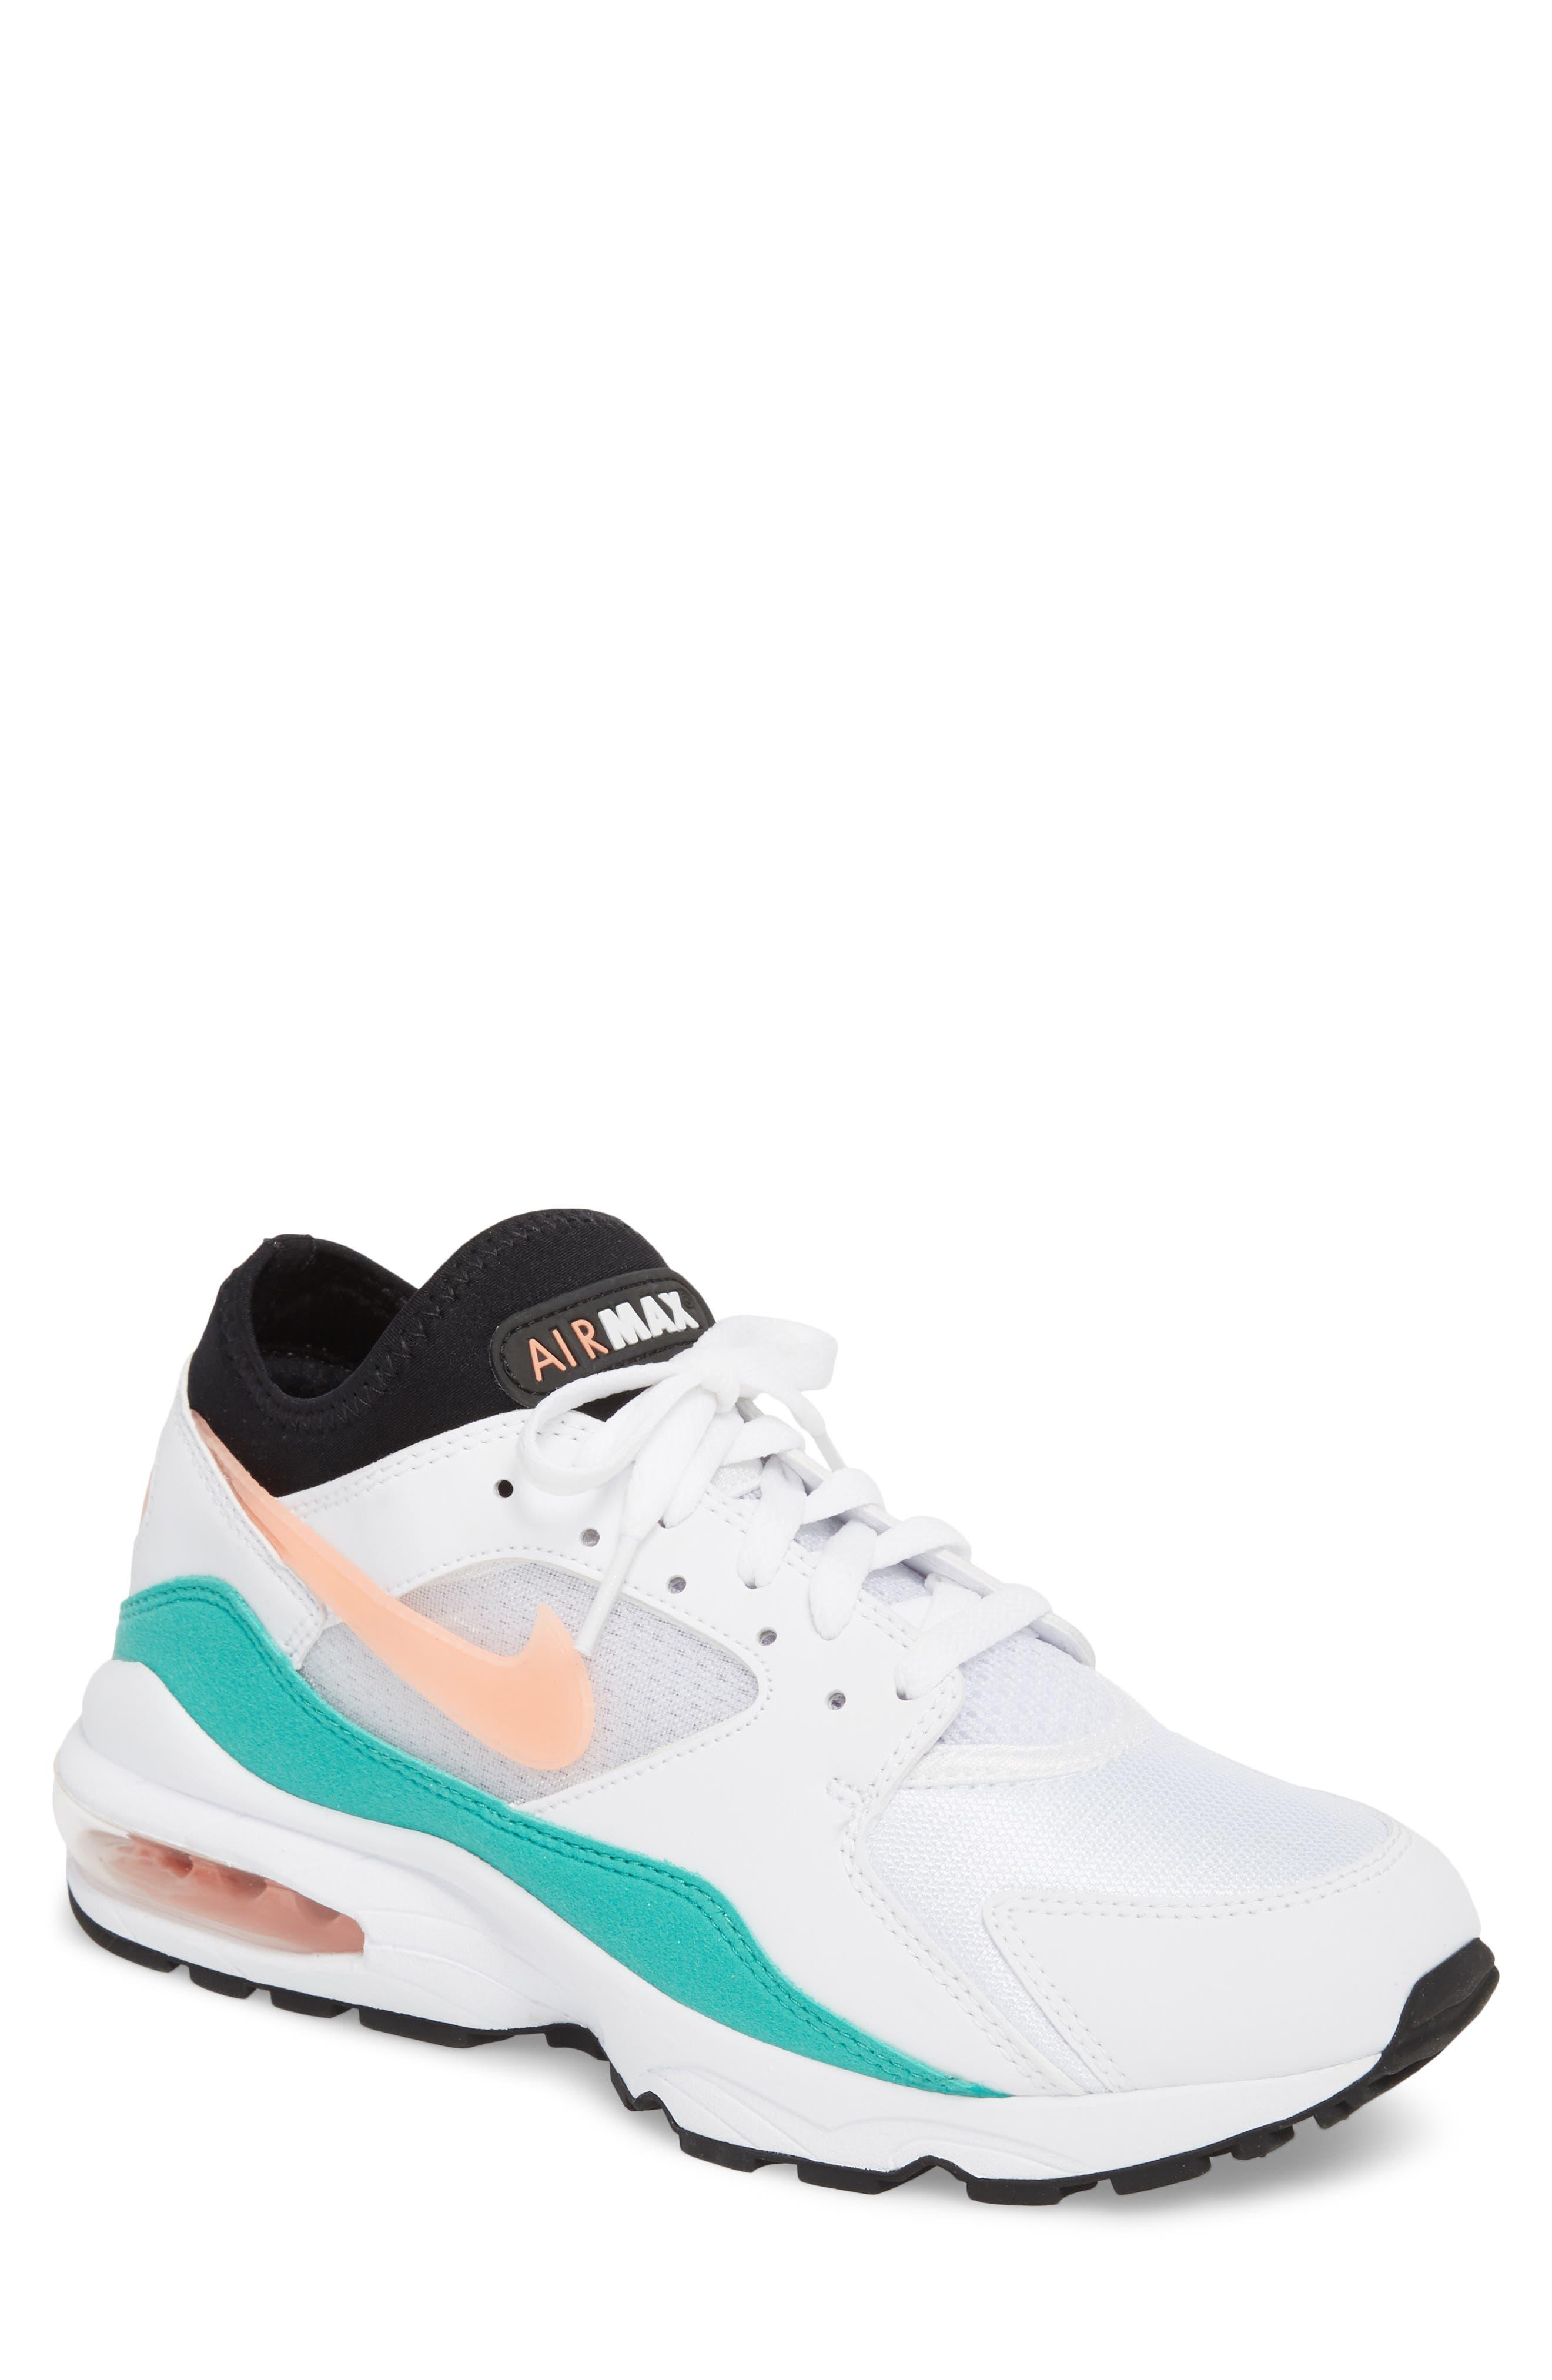 Air Max 93 Sneaker,                         Main,                         color, WHITE/ CRIMSON BLISS